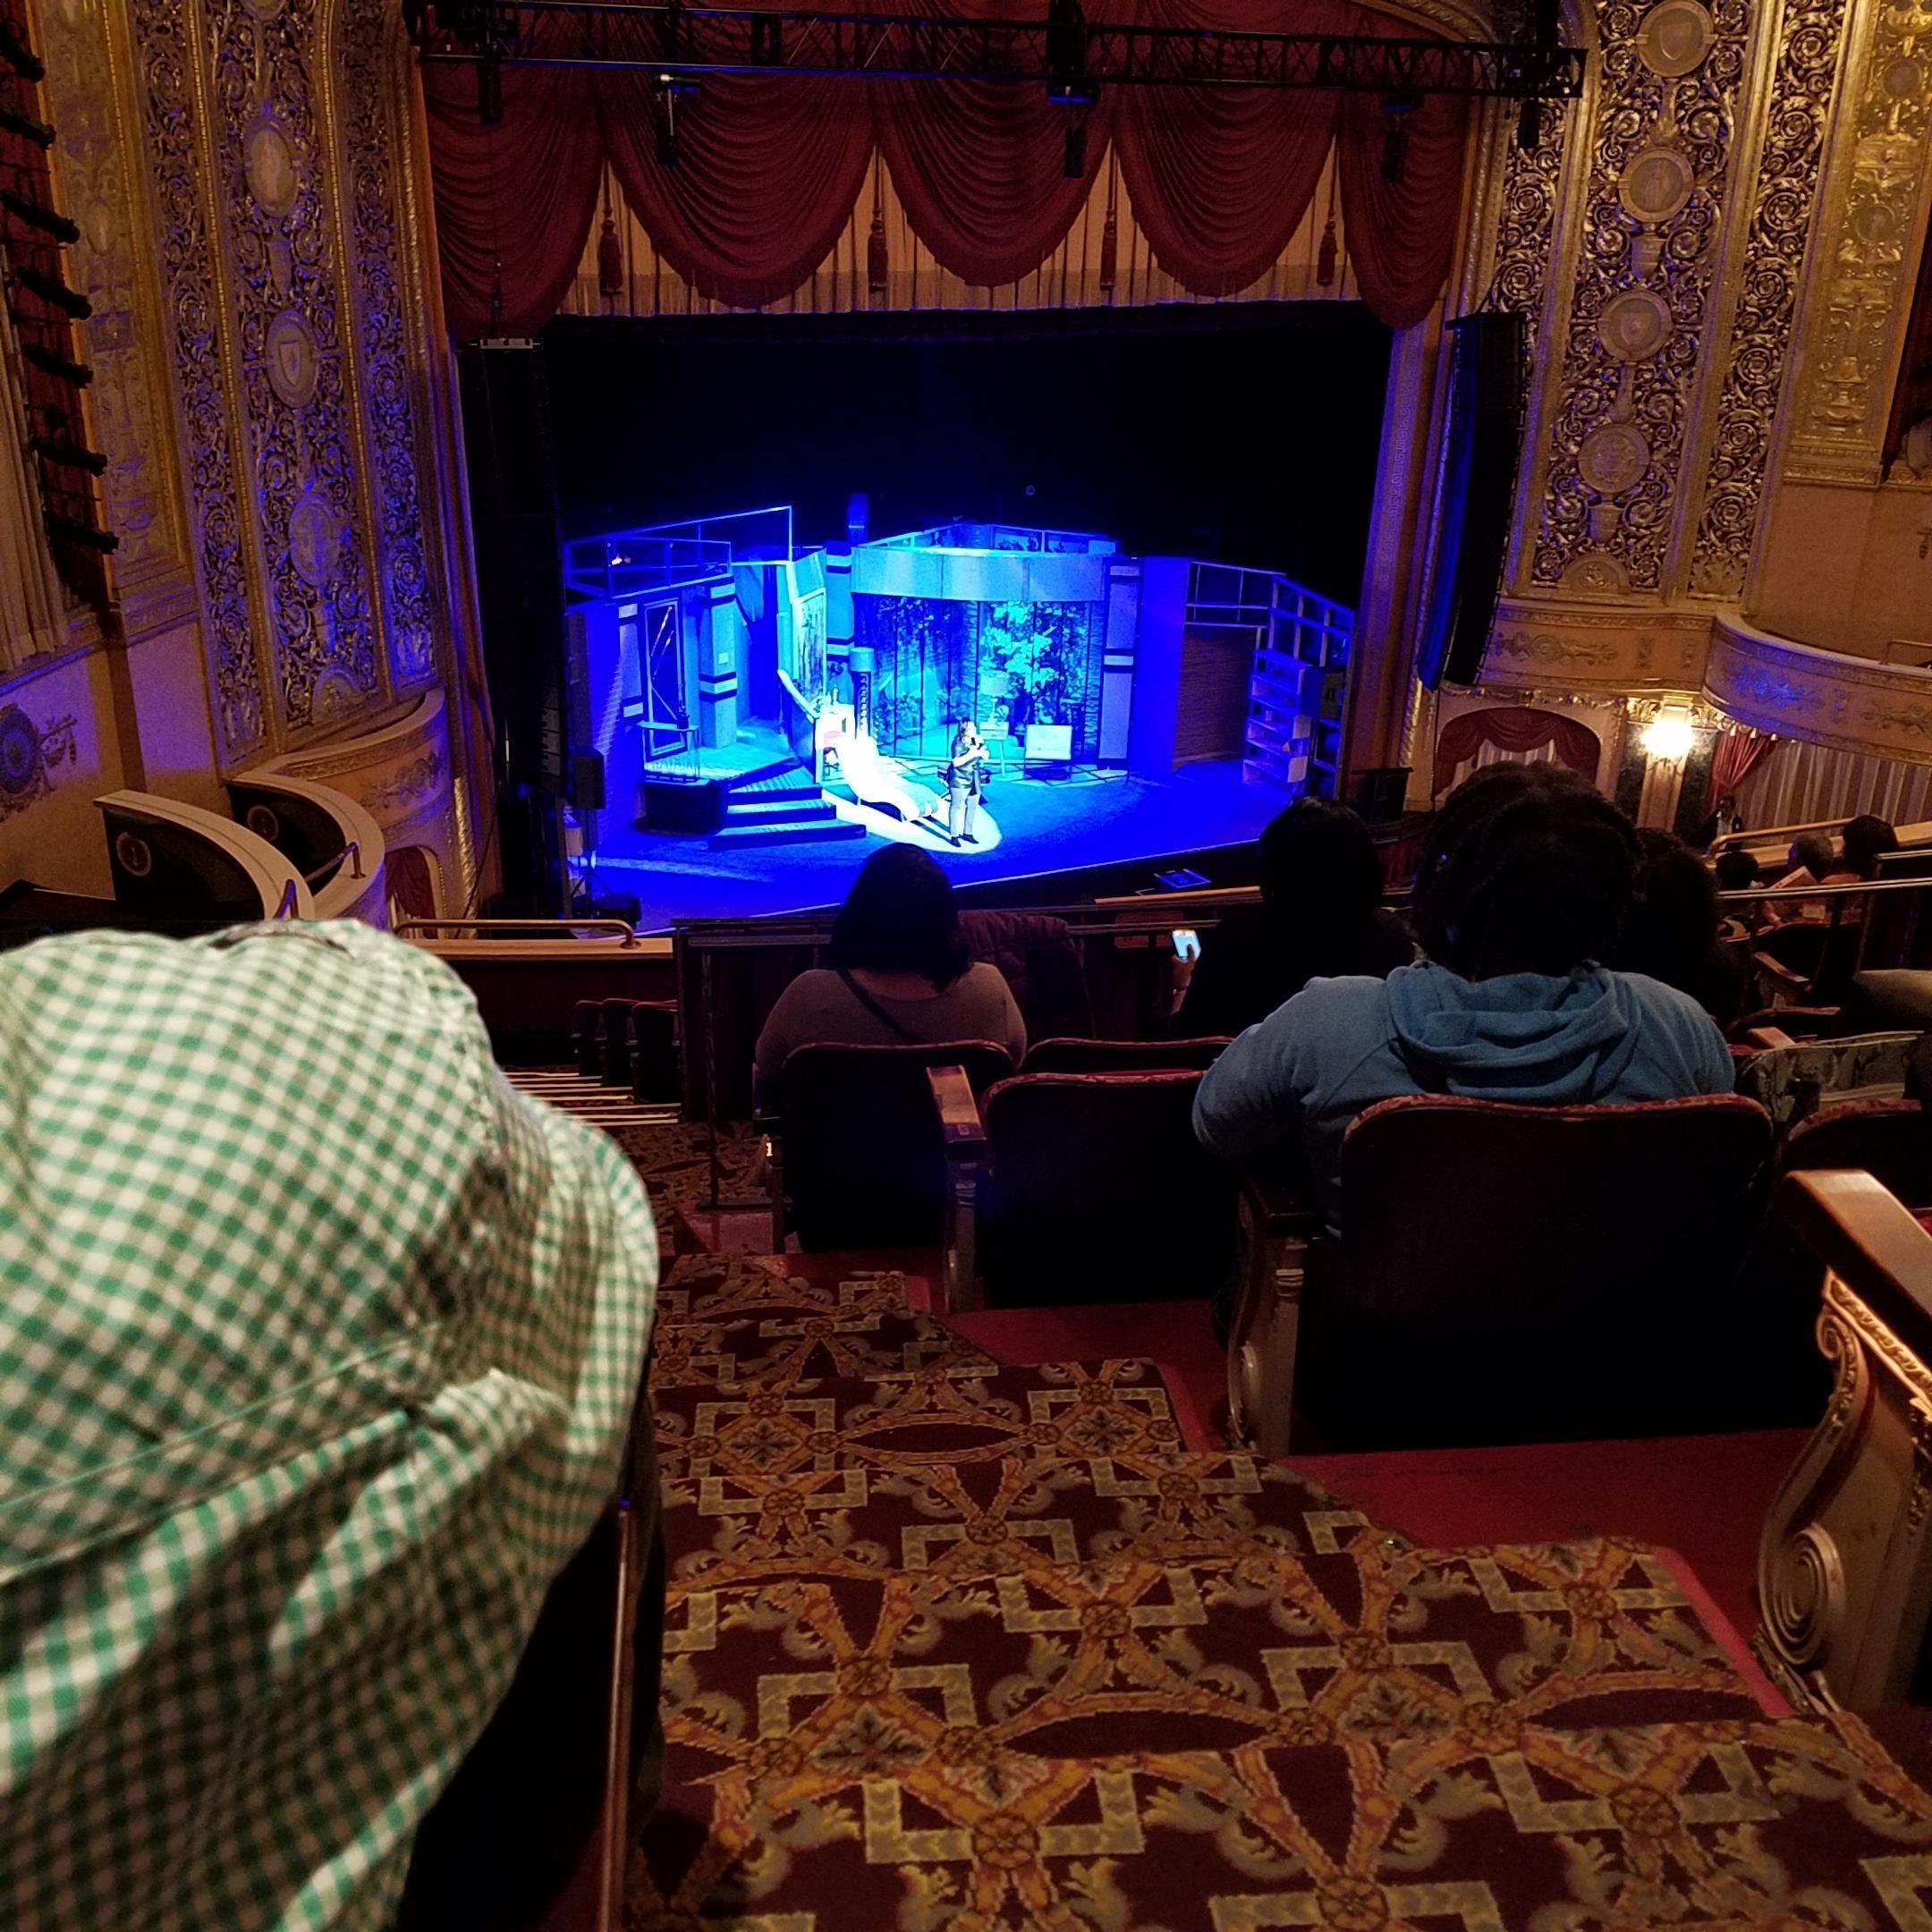 Warner Theatre (Washington, D.C.) Section Midbal Row FF Seat 25